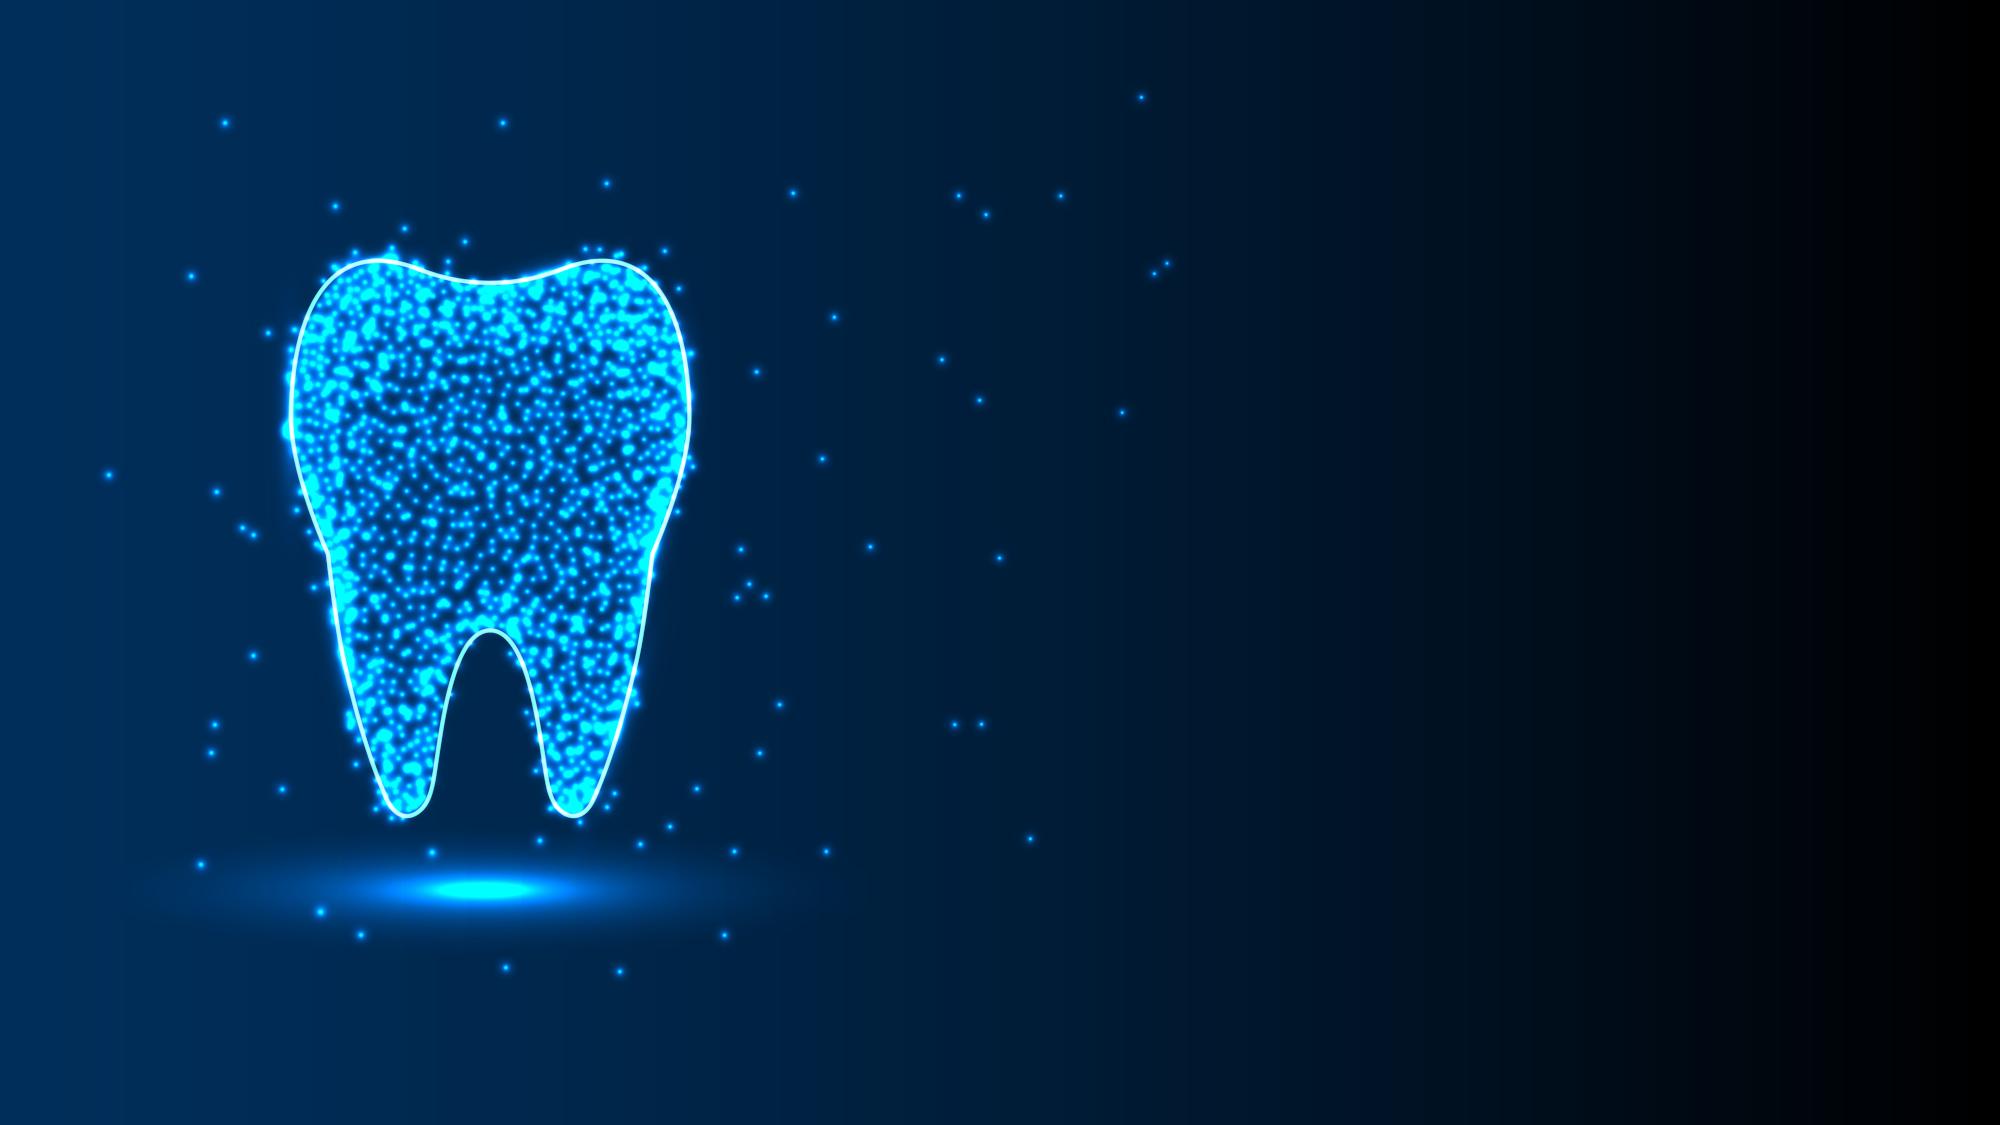 Disruptive technology—enhancing dentistry